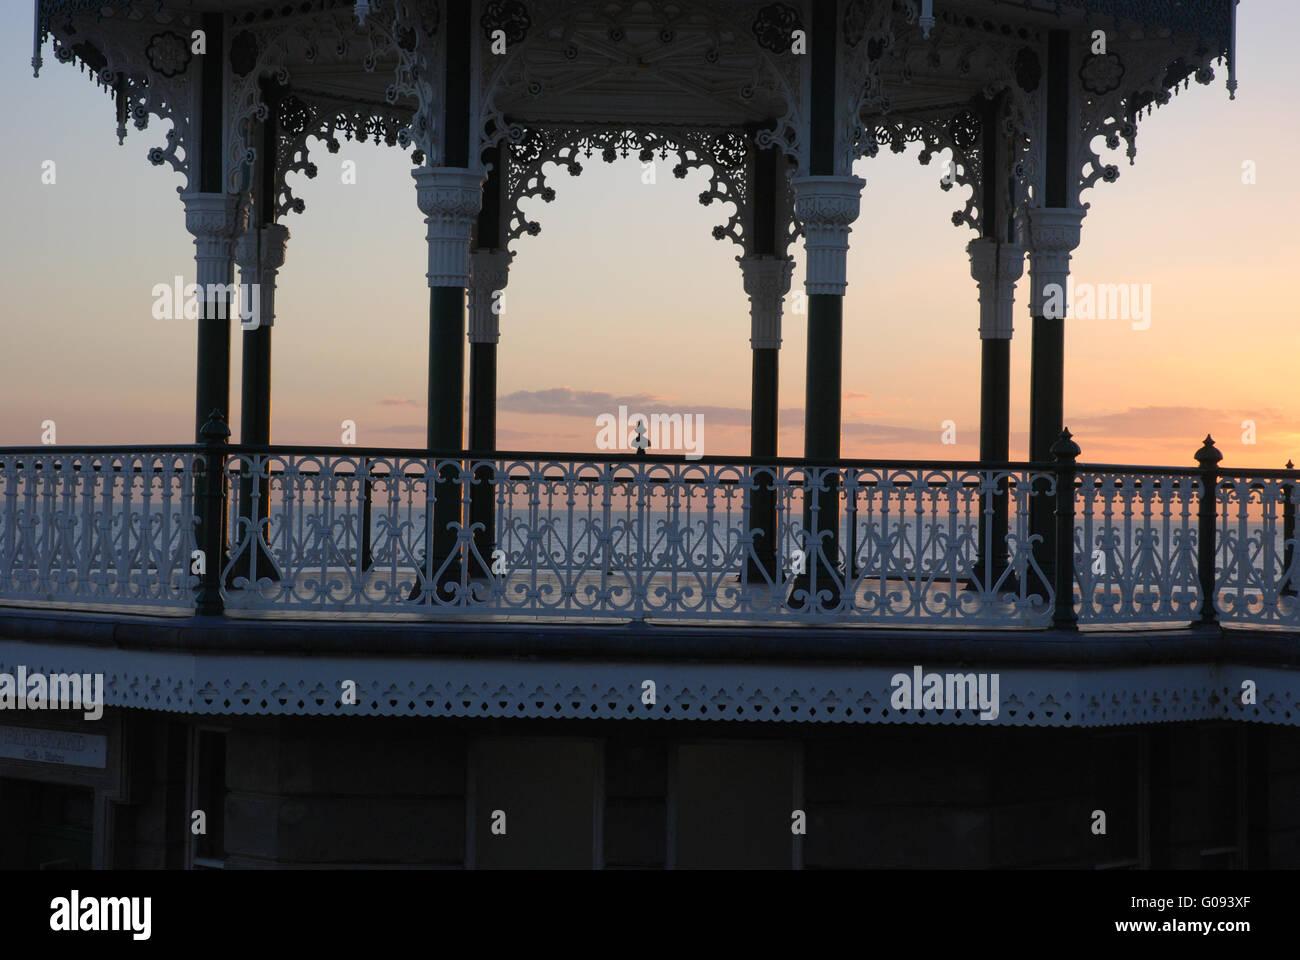 Brighton Bandstand sun set - Stock Image